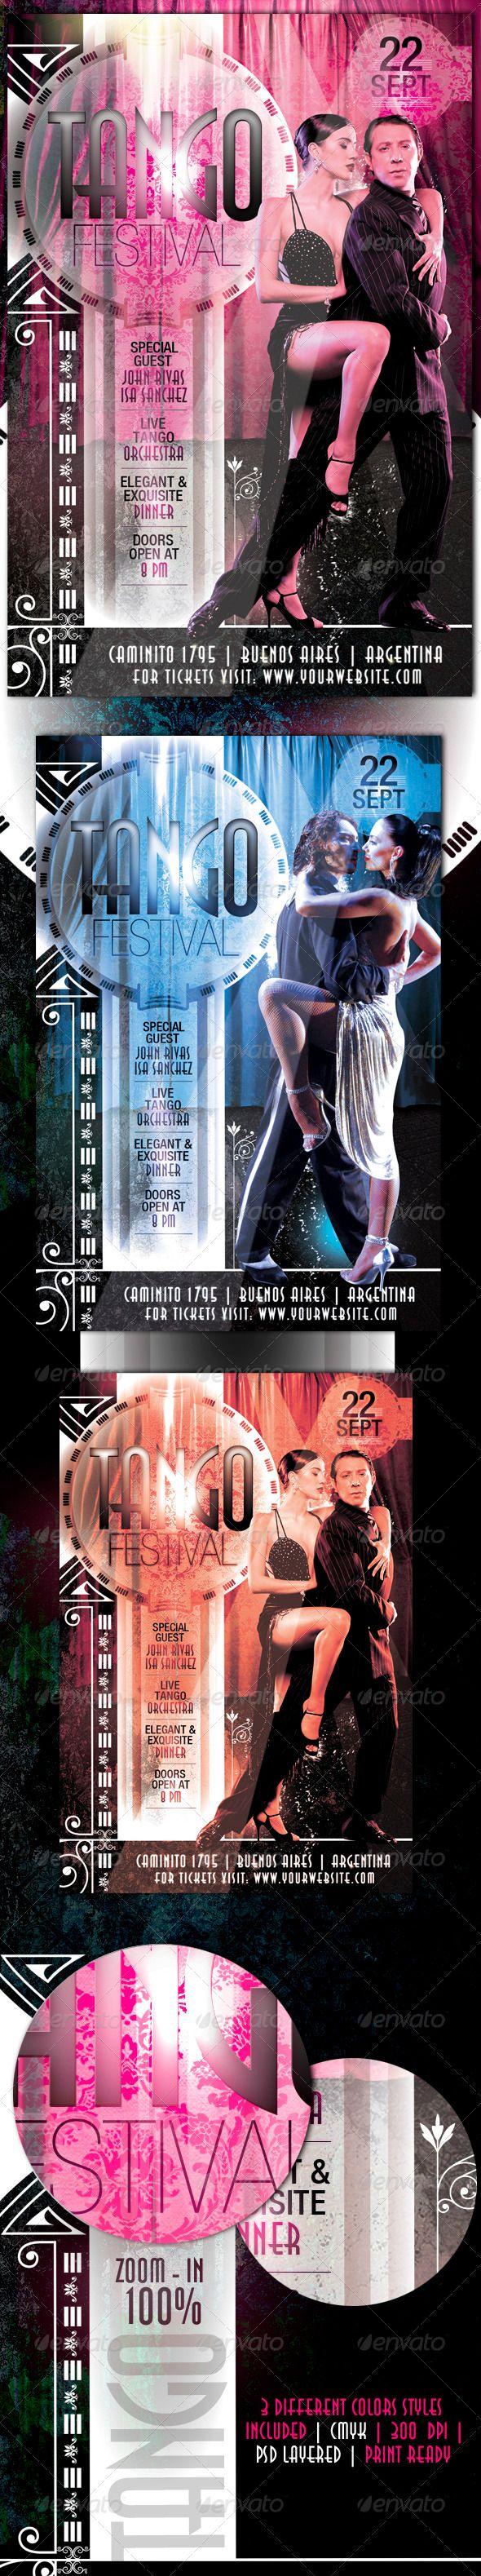 Tango Festival Flyer — Photoshop PSD #festival flyer #elegancy flyer • Available here → https://graphicriver.net/item/tango-festival-flyer/516229?ref=pxcr